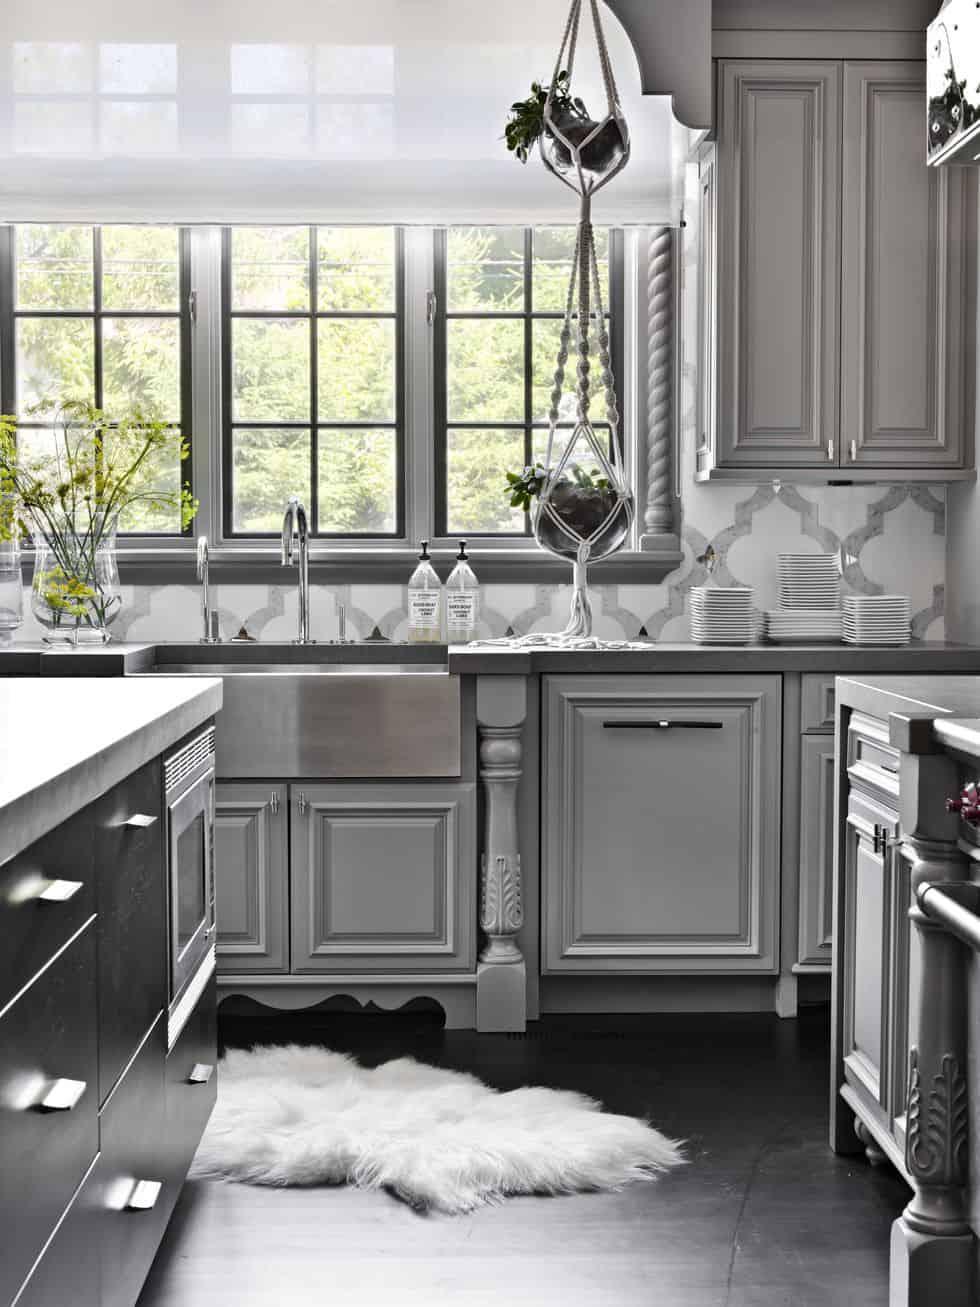 gray walls in kitchen